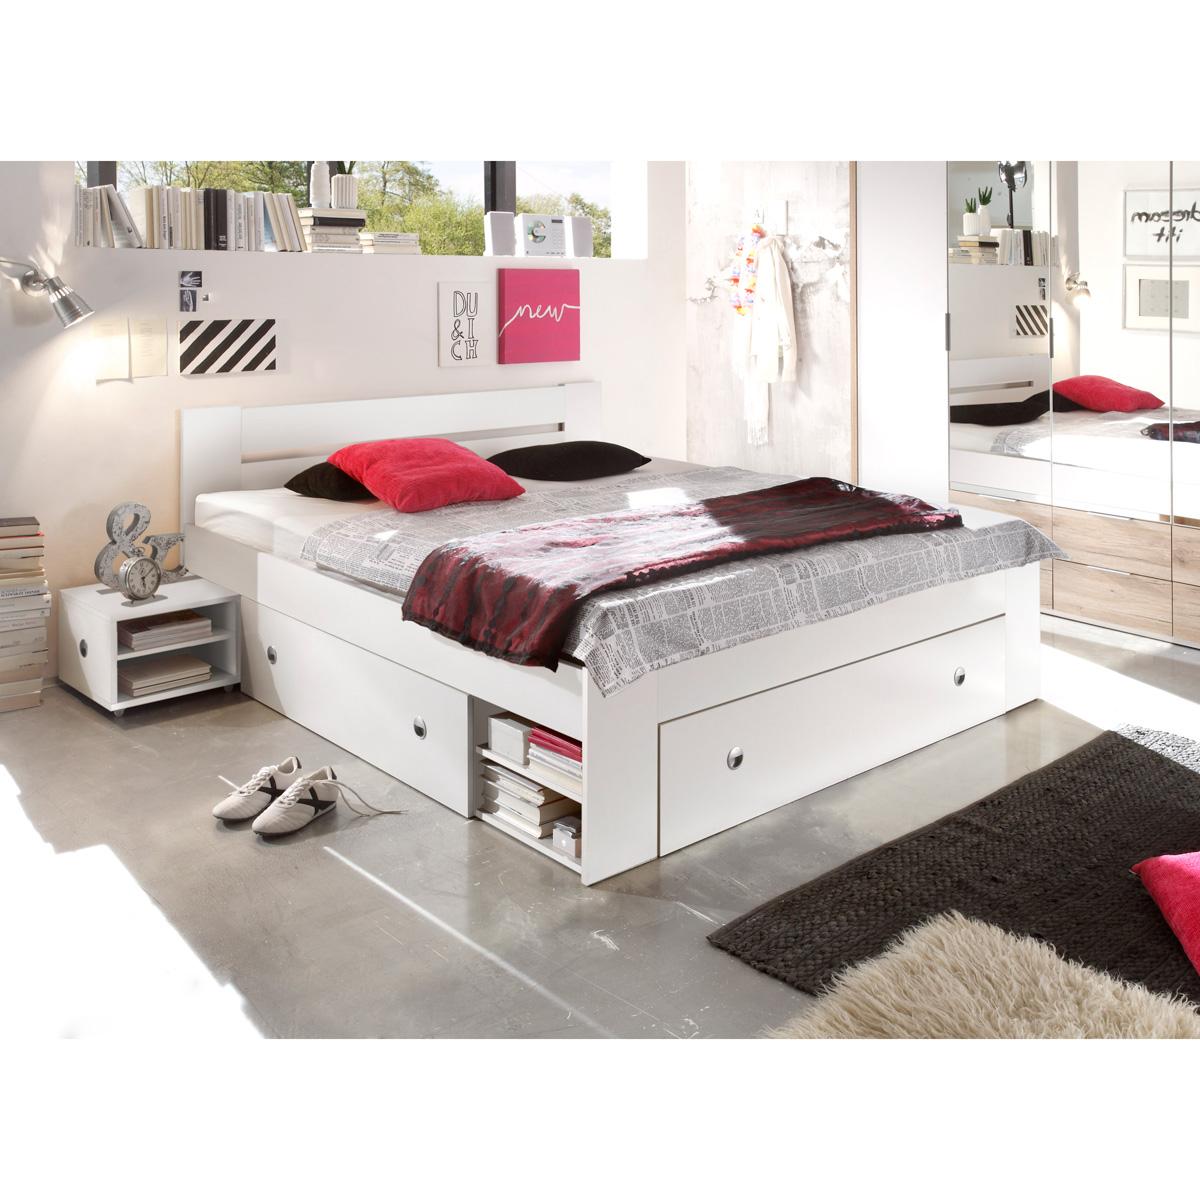 bett stefan funktionsbett doppelbett bettanlage mit. Black Bedroom Furniture Sets. Home Design Ideas